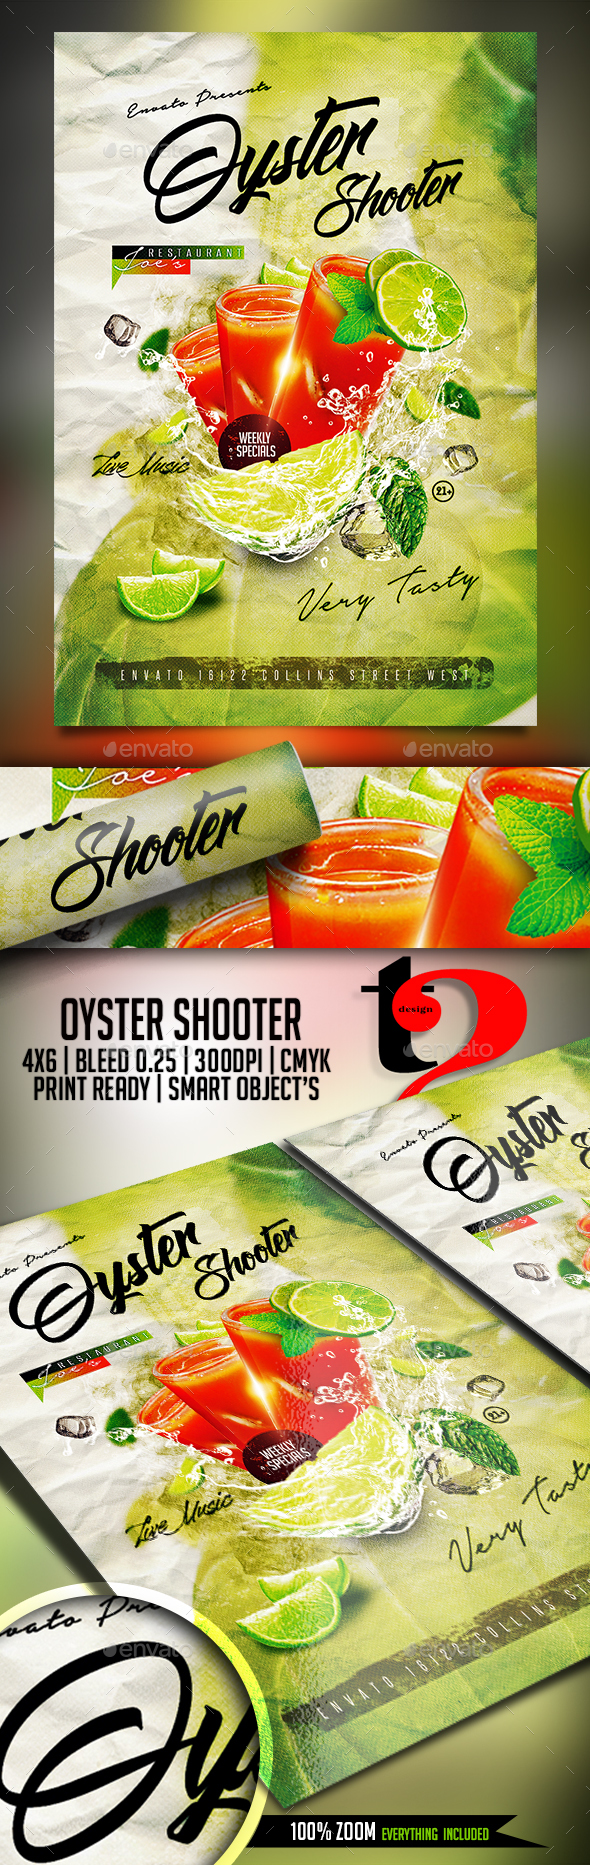 Oyster Shooter Flyer Template - Restaurant Flyers